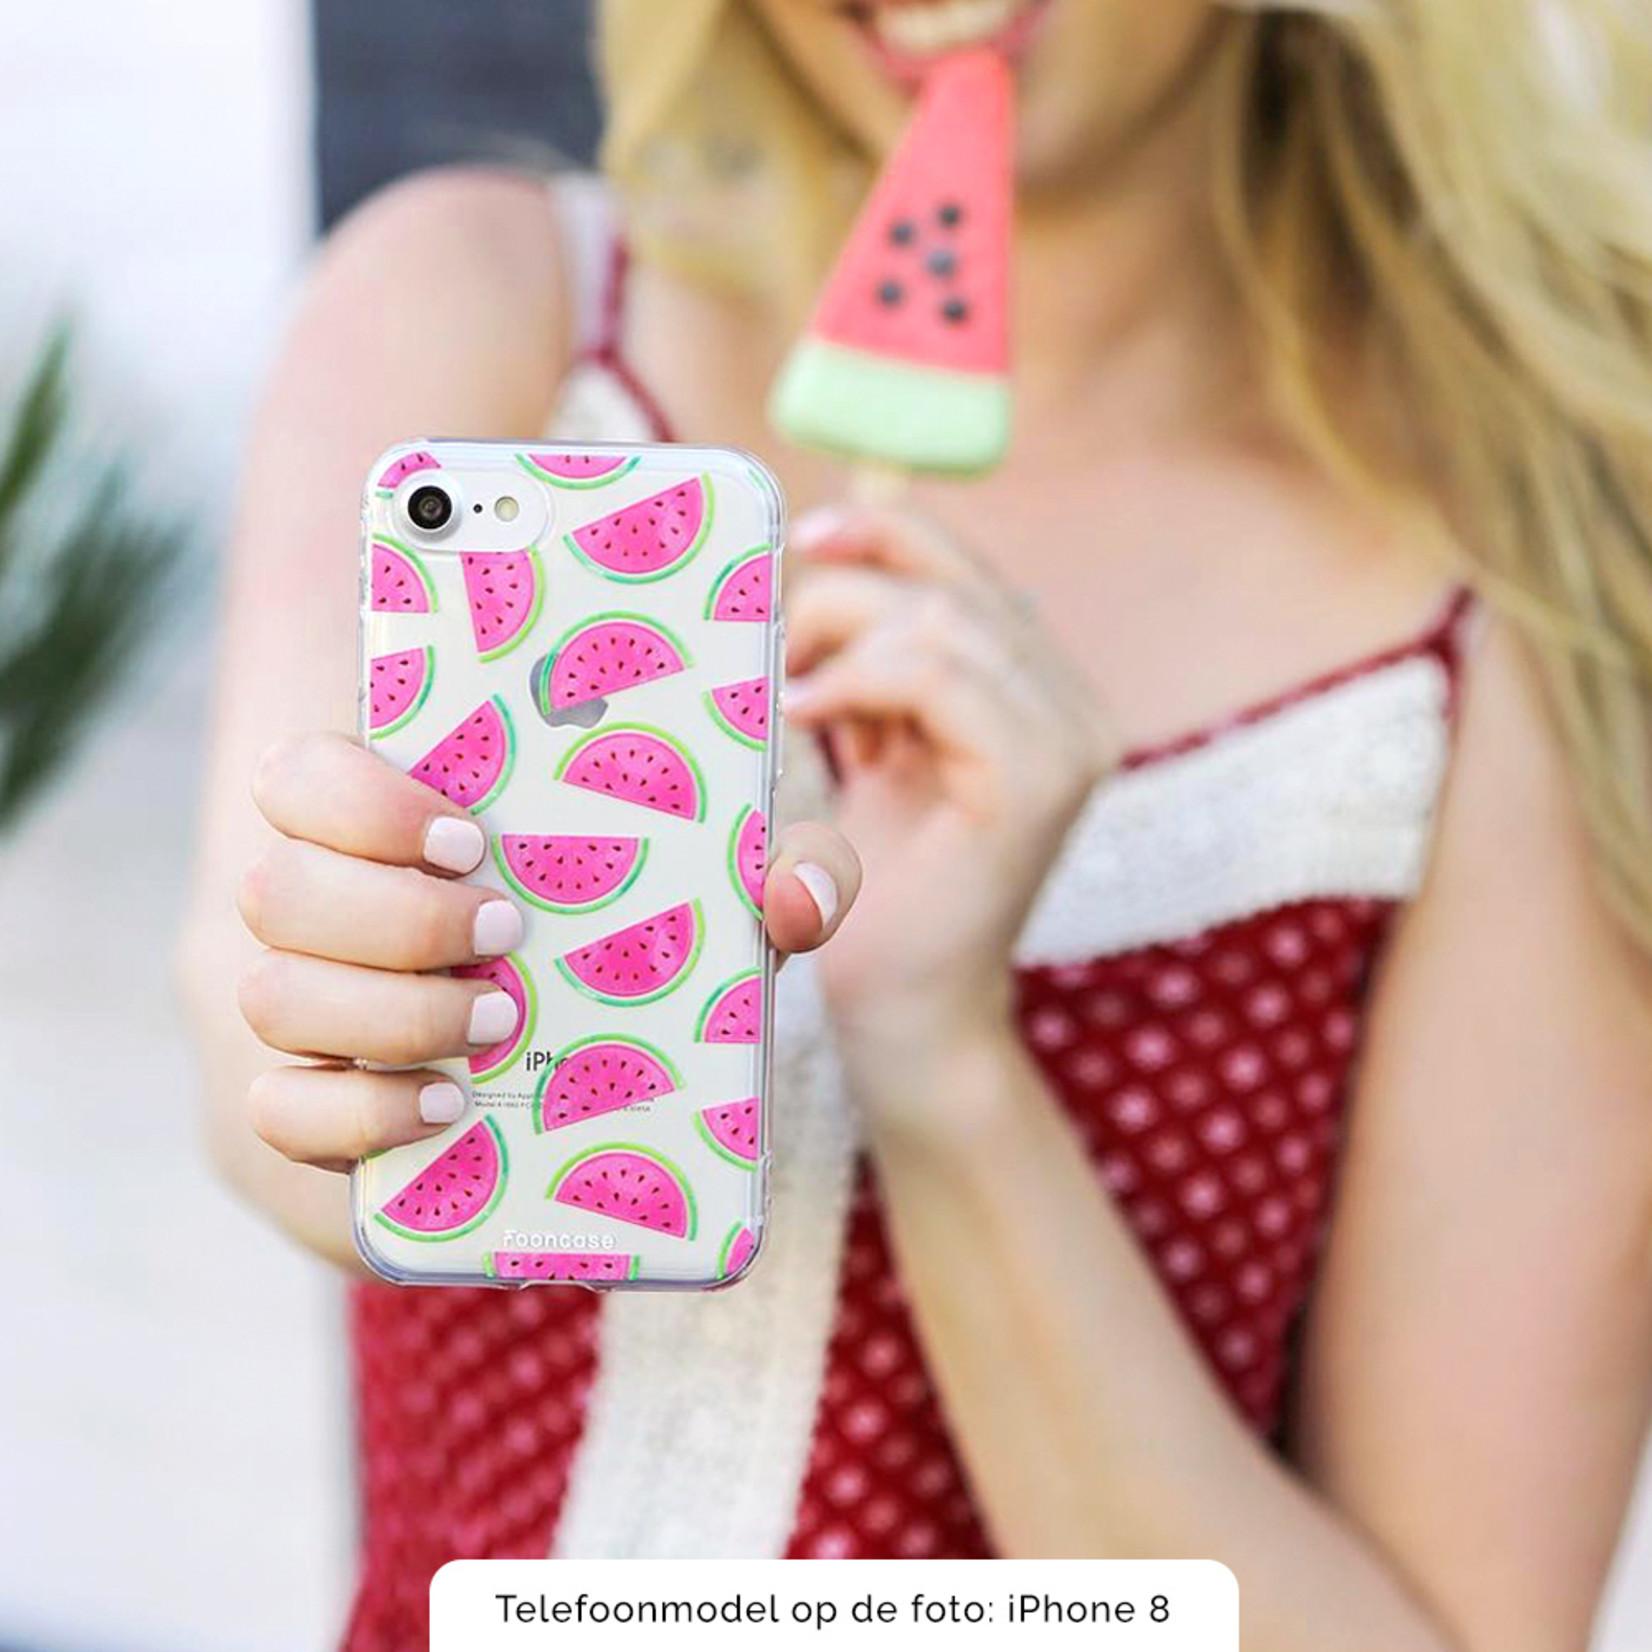 FOONCASE Iphone 7 Plus Handyhülle - Wassermelone